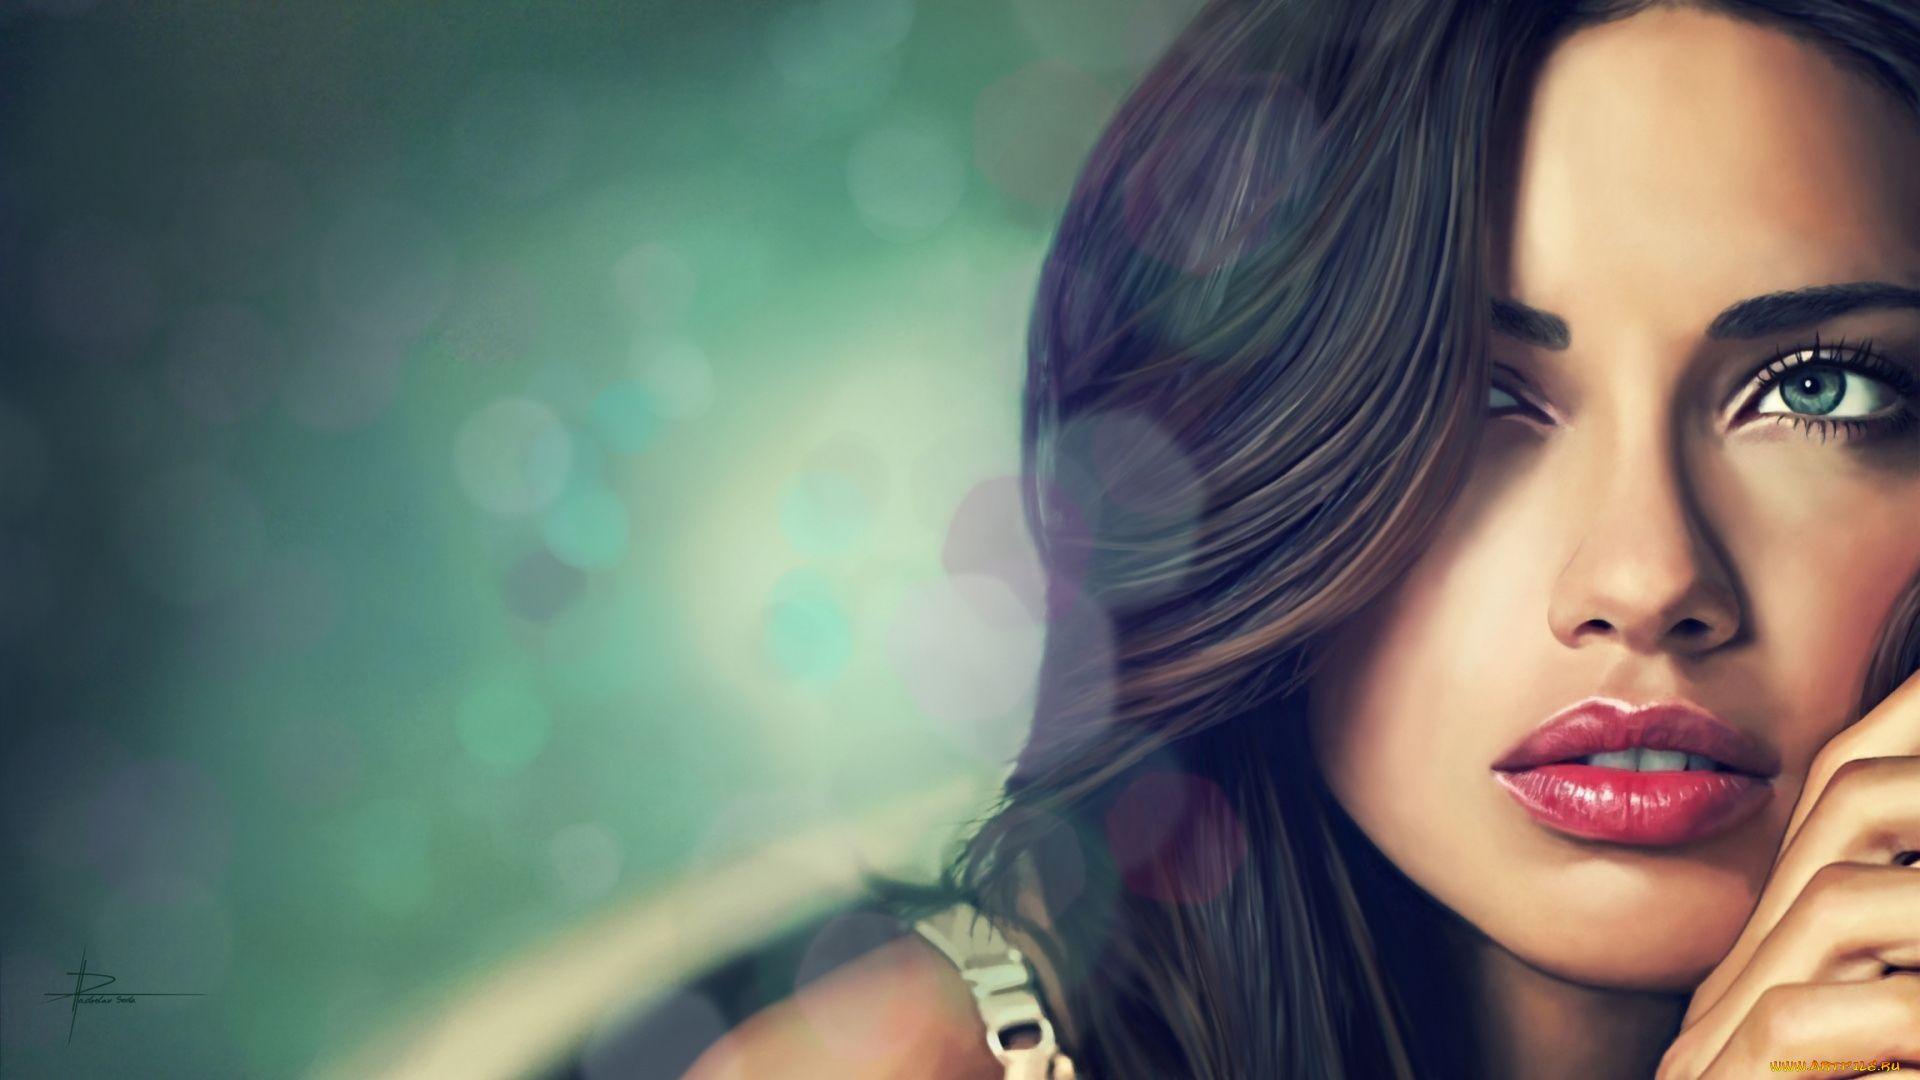 Adriana Lima Face Wallpaper